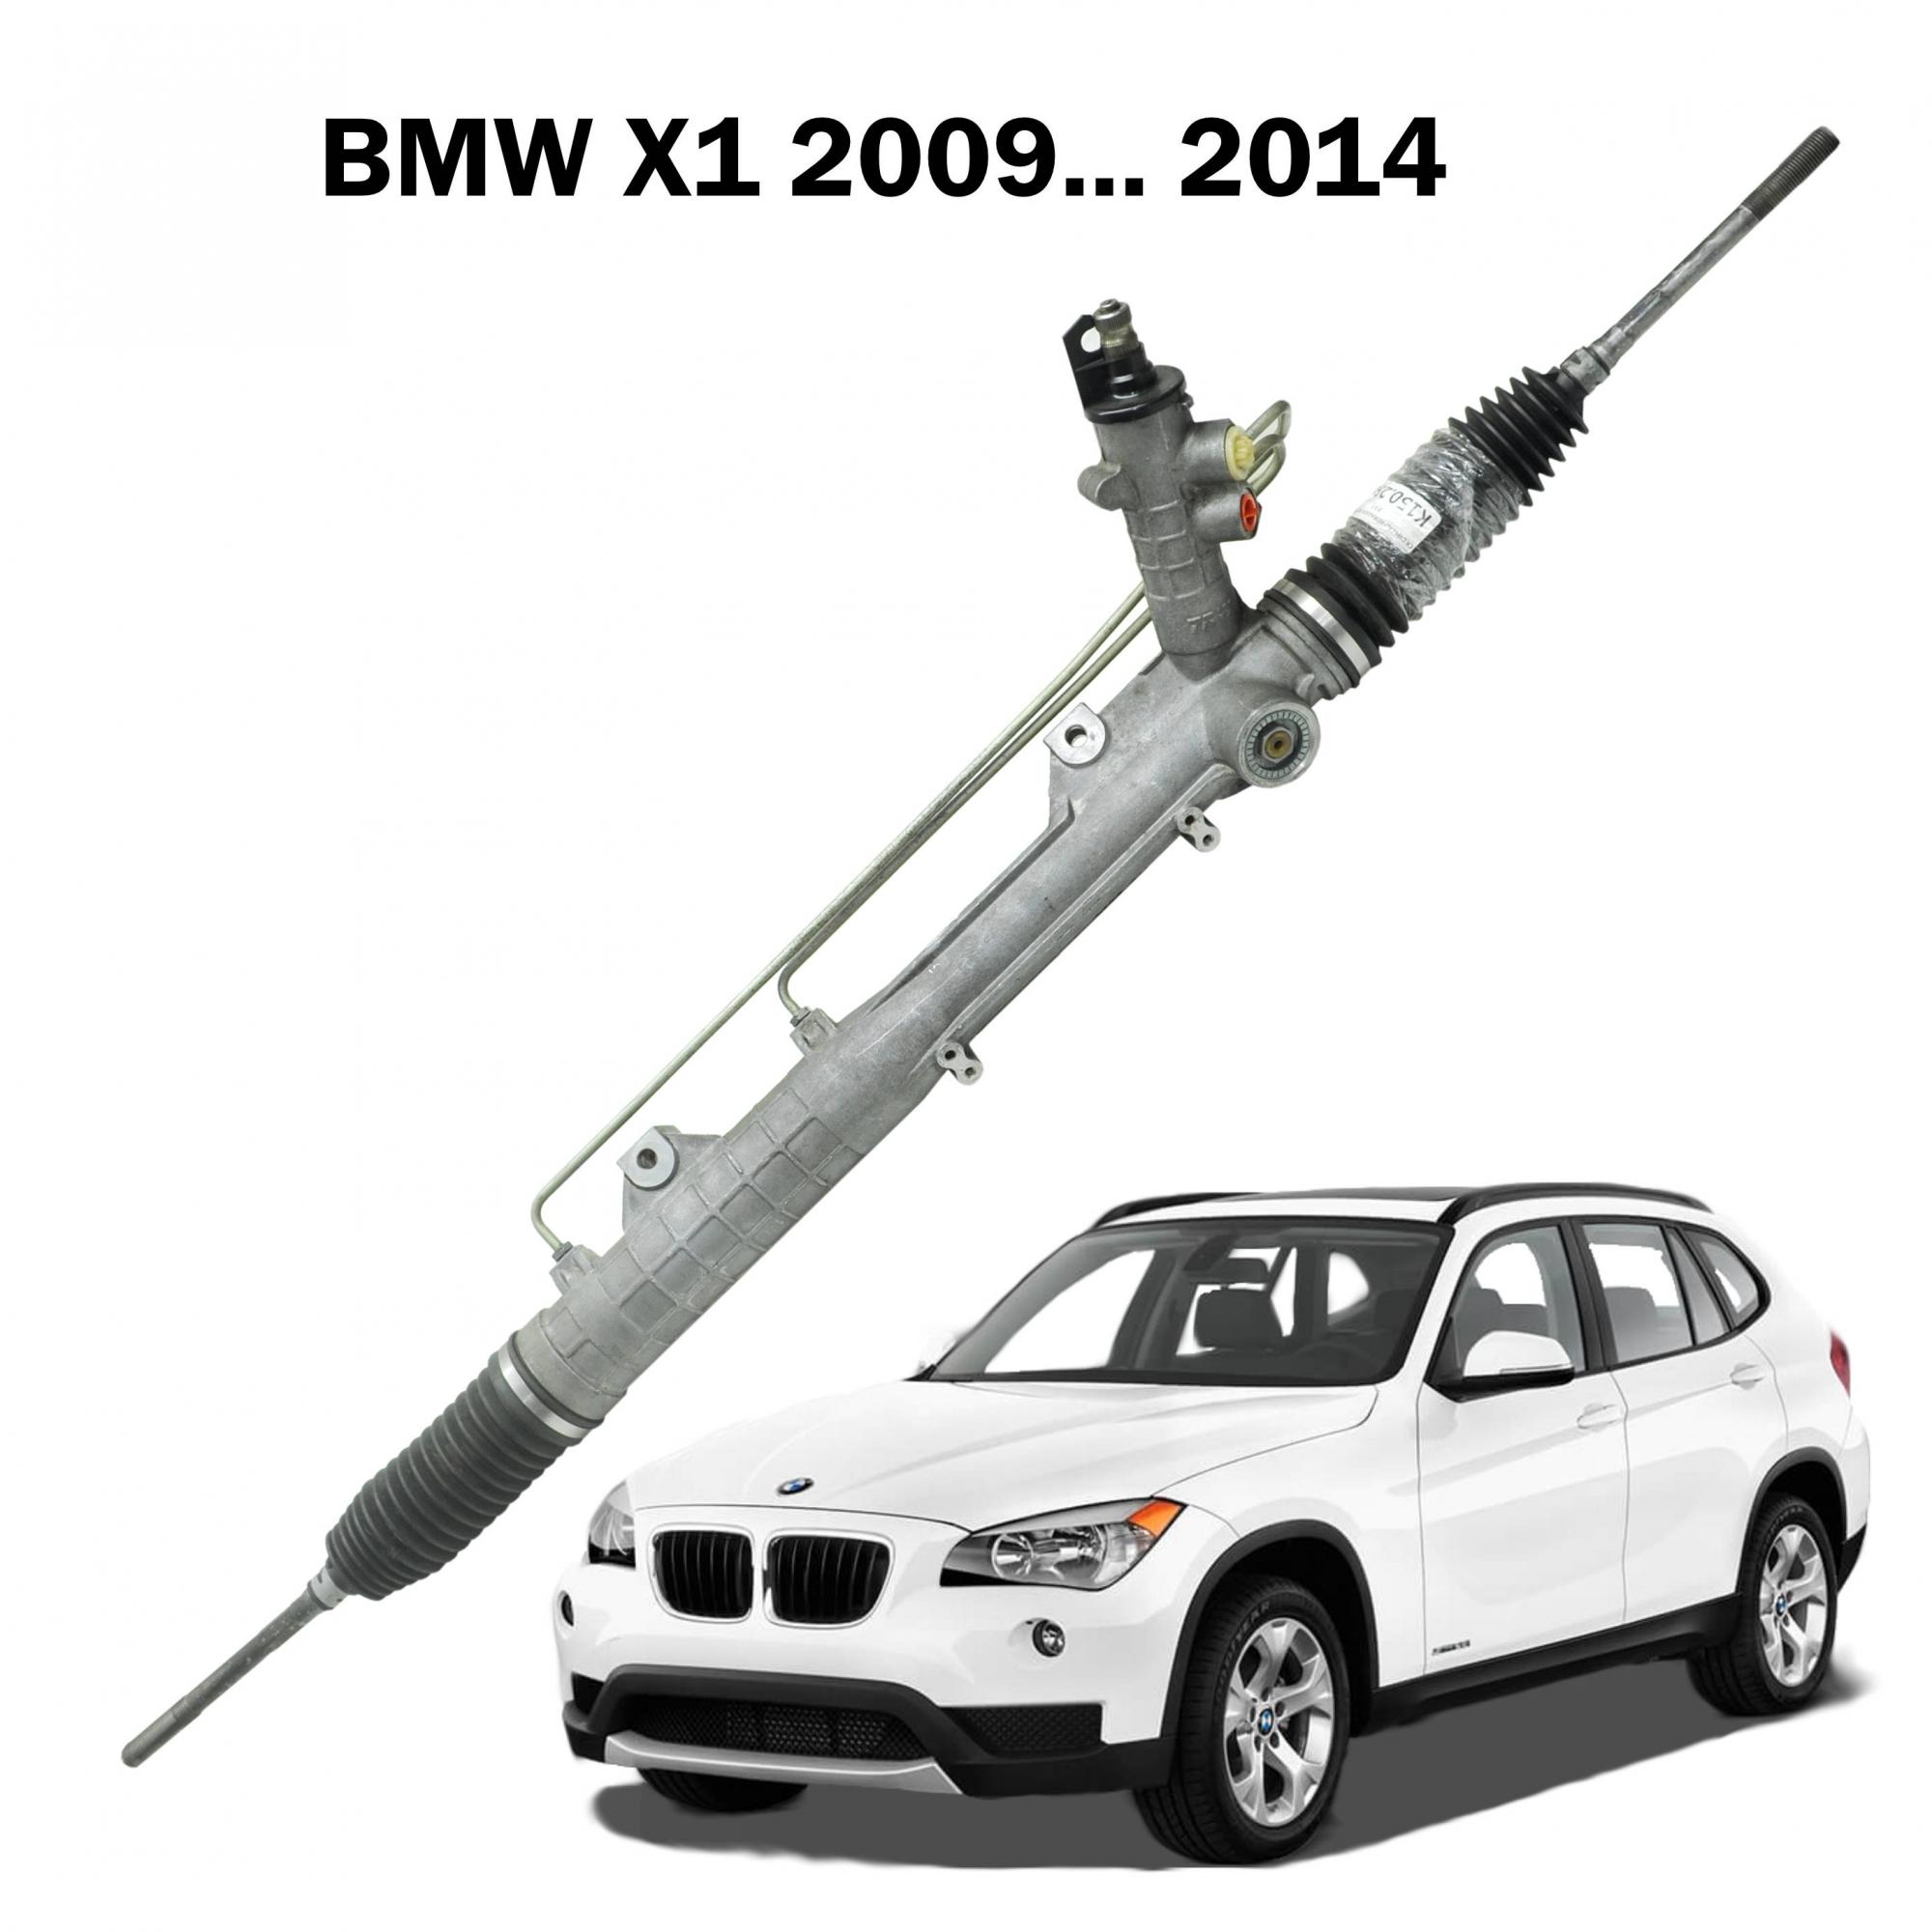 Caixa Direção Hidráulica TRW BMW X1 2009...2014 S/ Servotronic